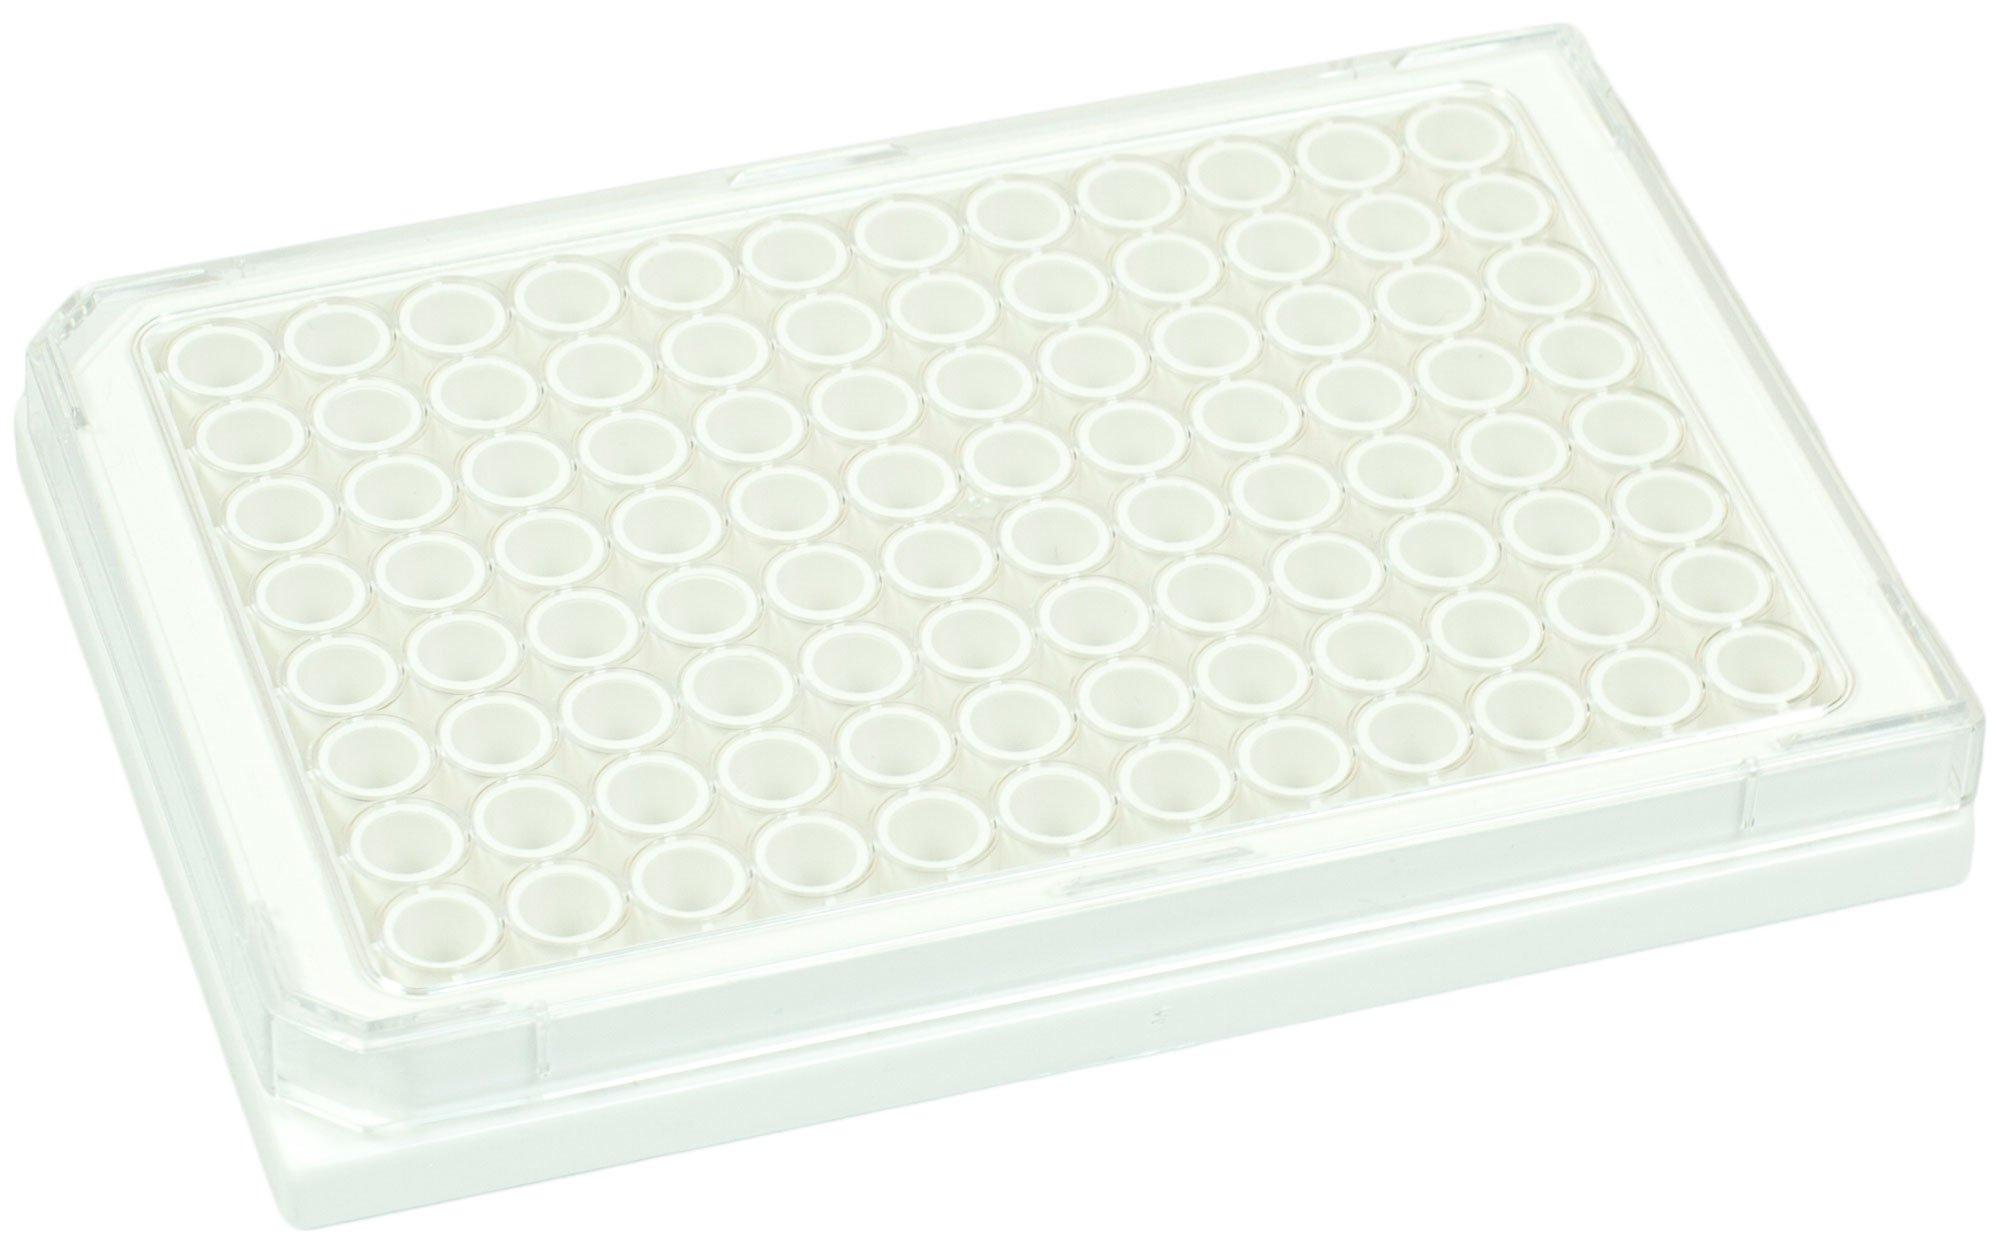 BRANDplates pureGrade S Non-Treated Sterile Surface 96-Well Plate - White, Transparent F-Bottom